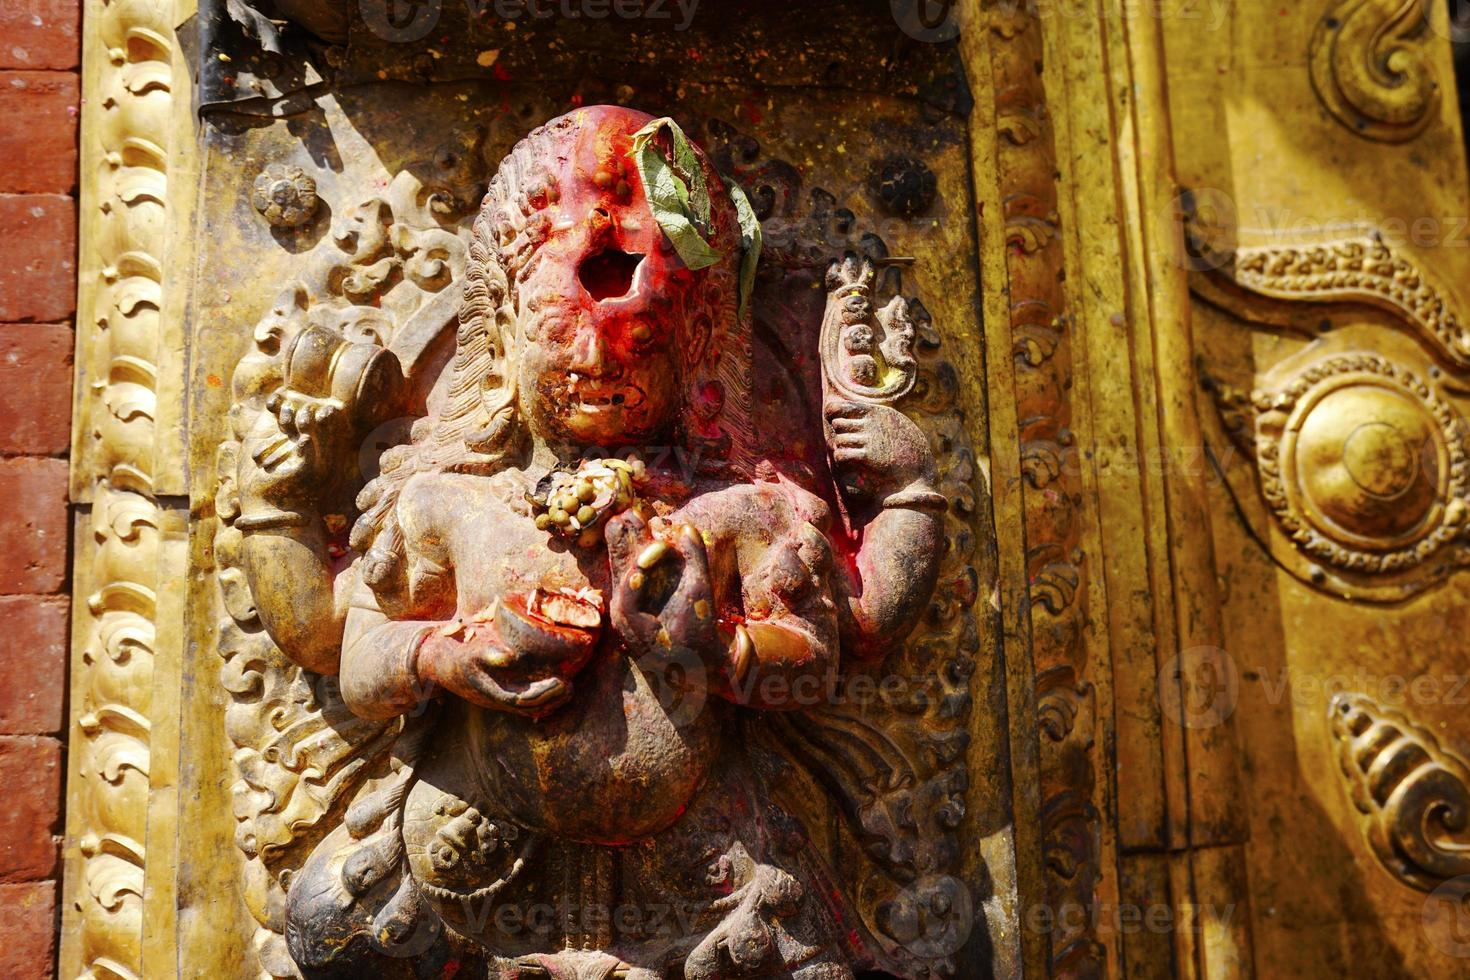 shiva hindoe-god om te bidden foto